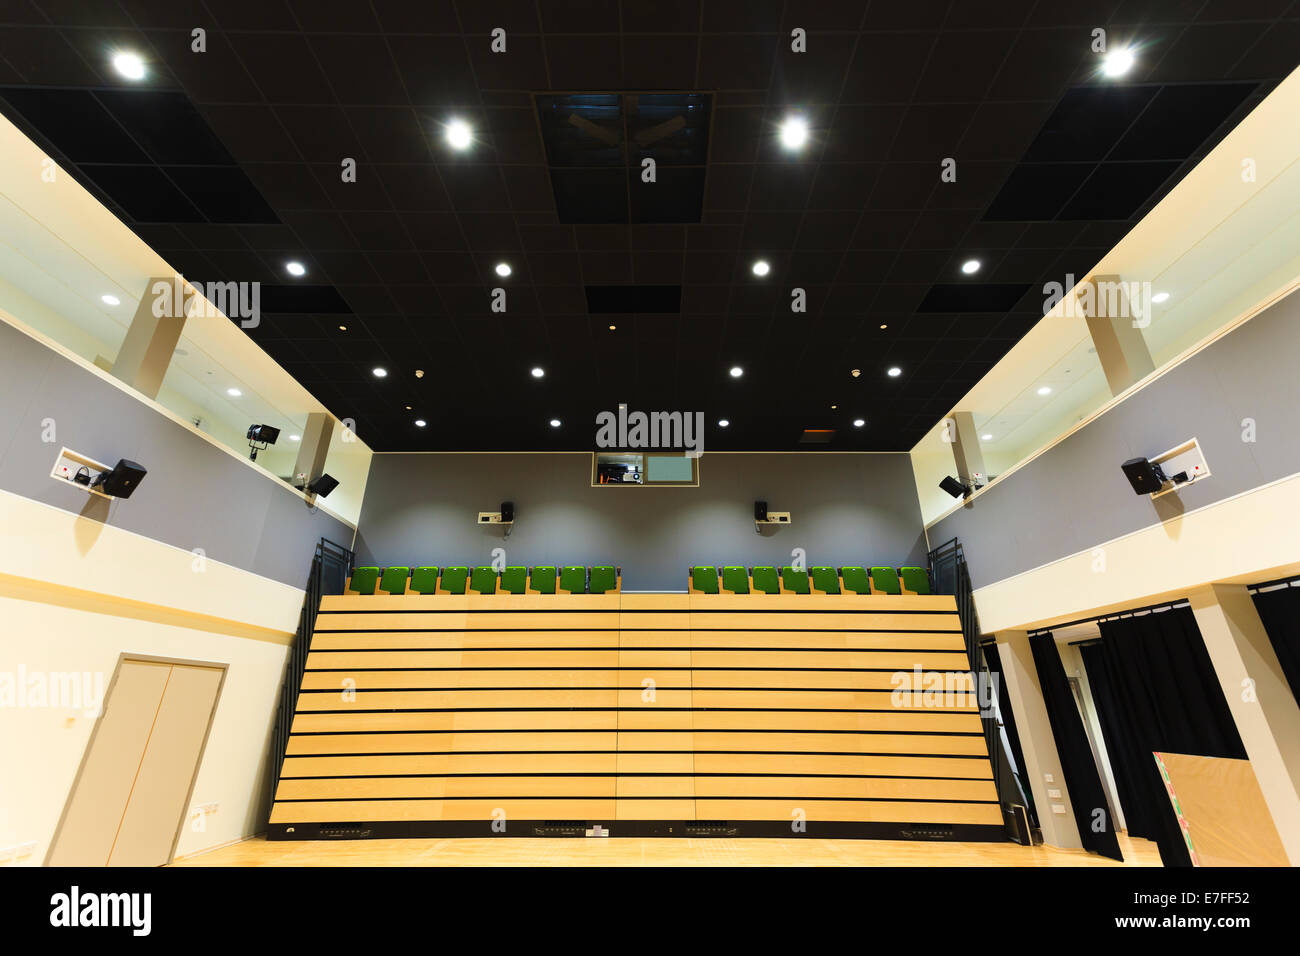 Auditorium at Park Community School with retractable motorised seating. - Stock Image